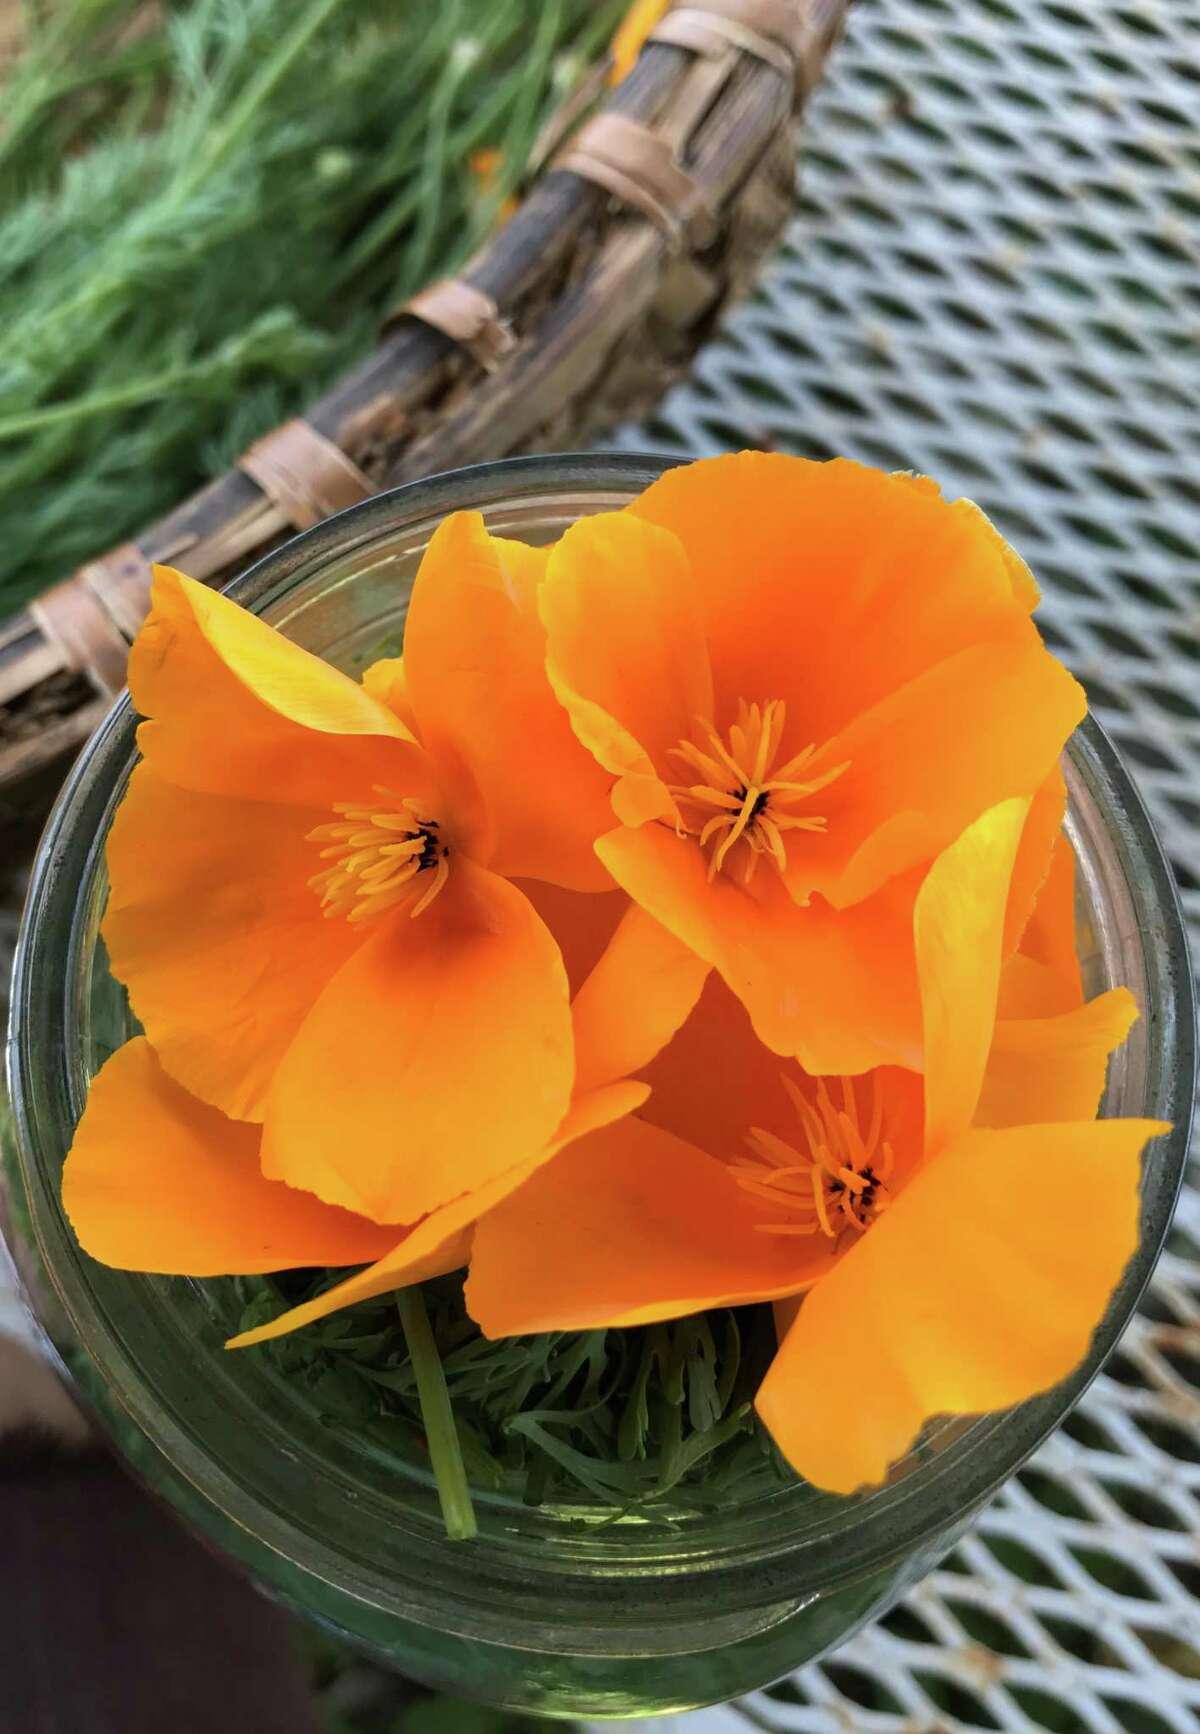 California poppy, which Underground Alchemist's Rebecca Hein said is used to make a tincture